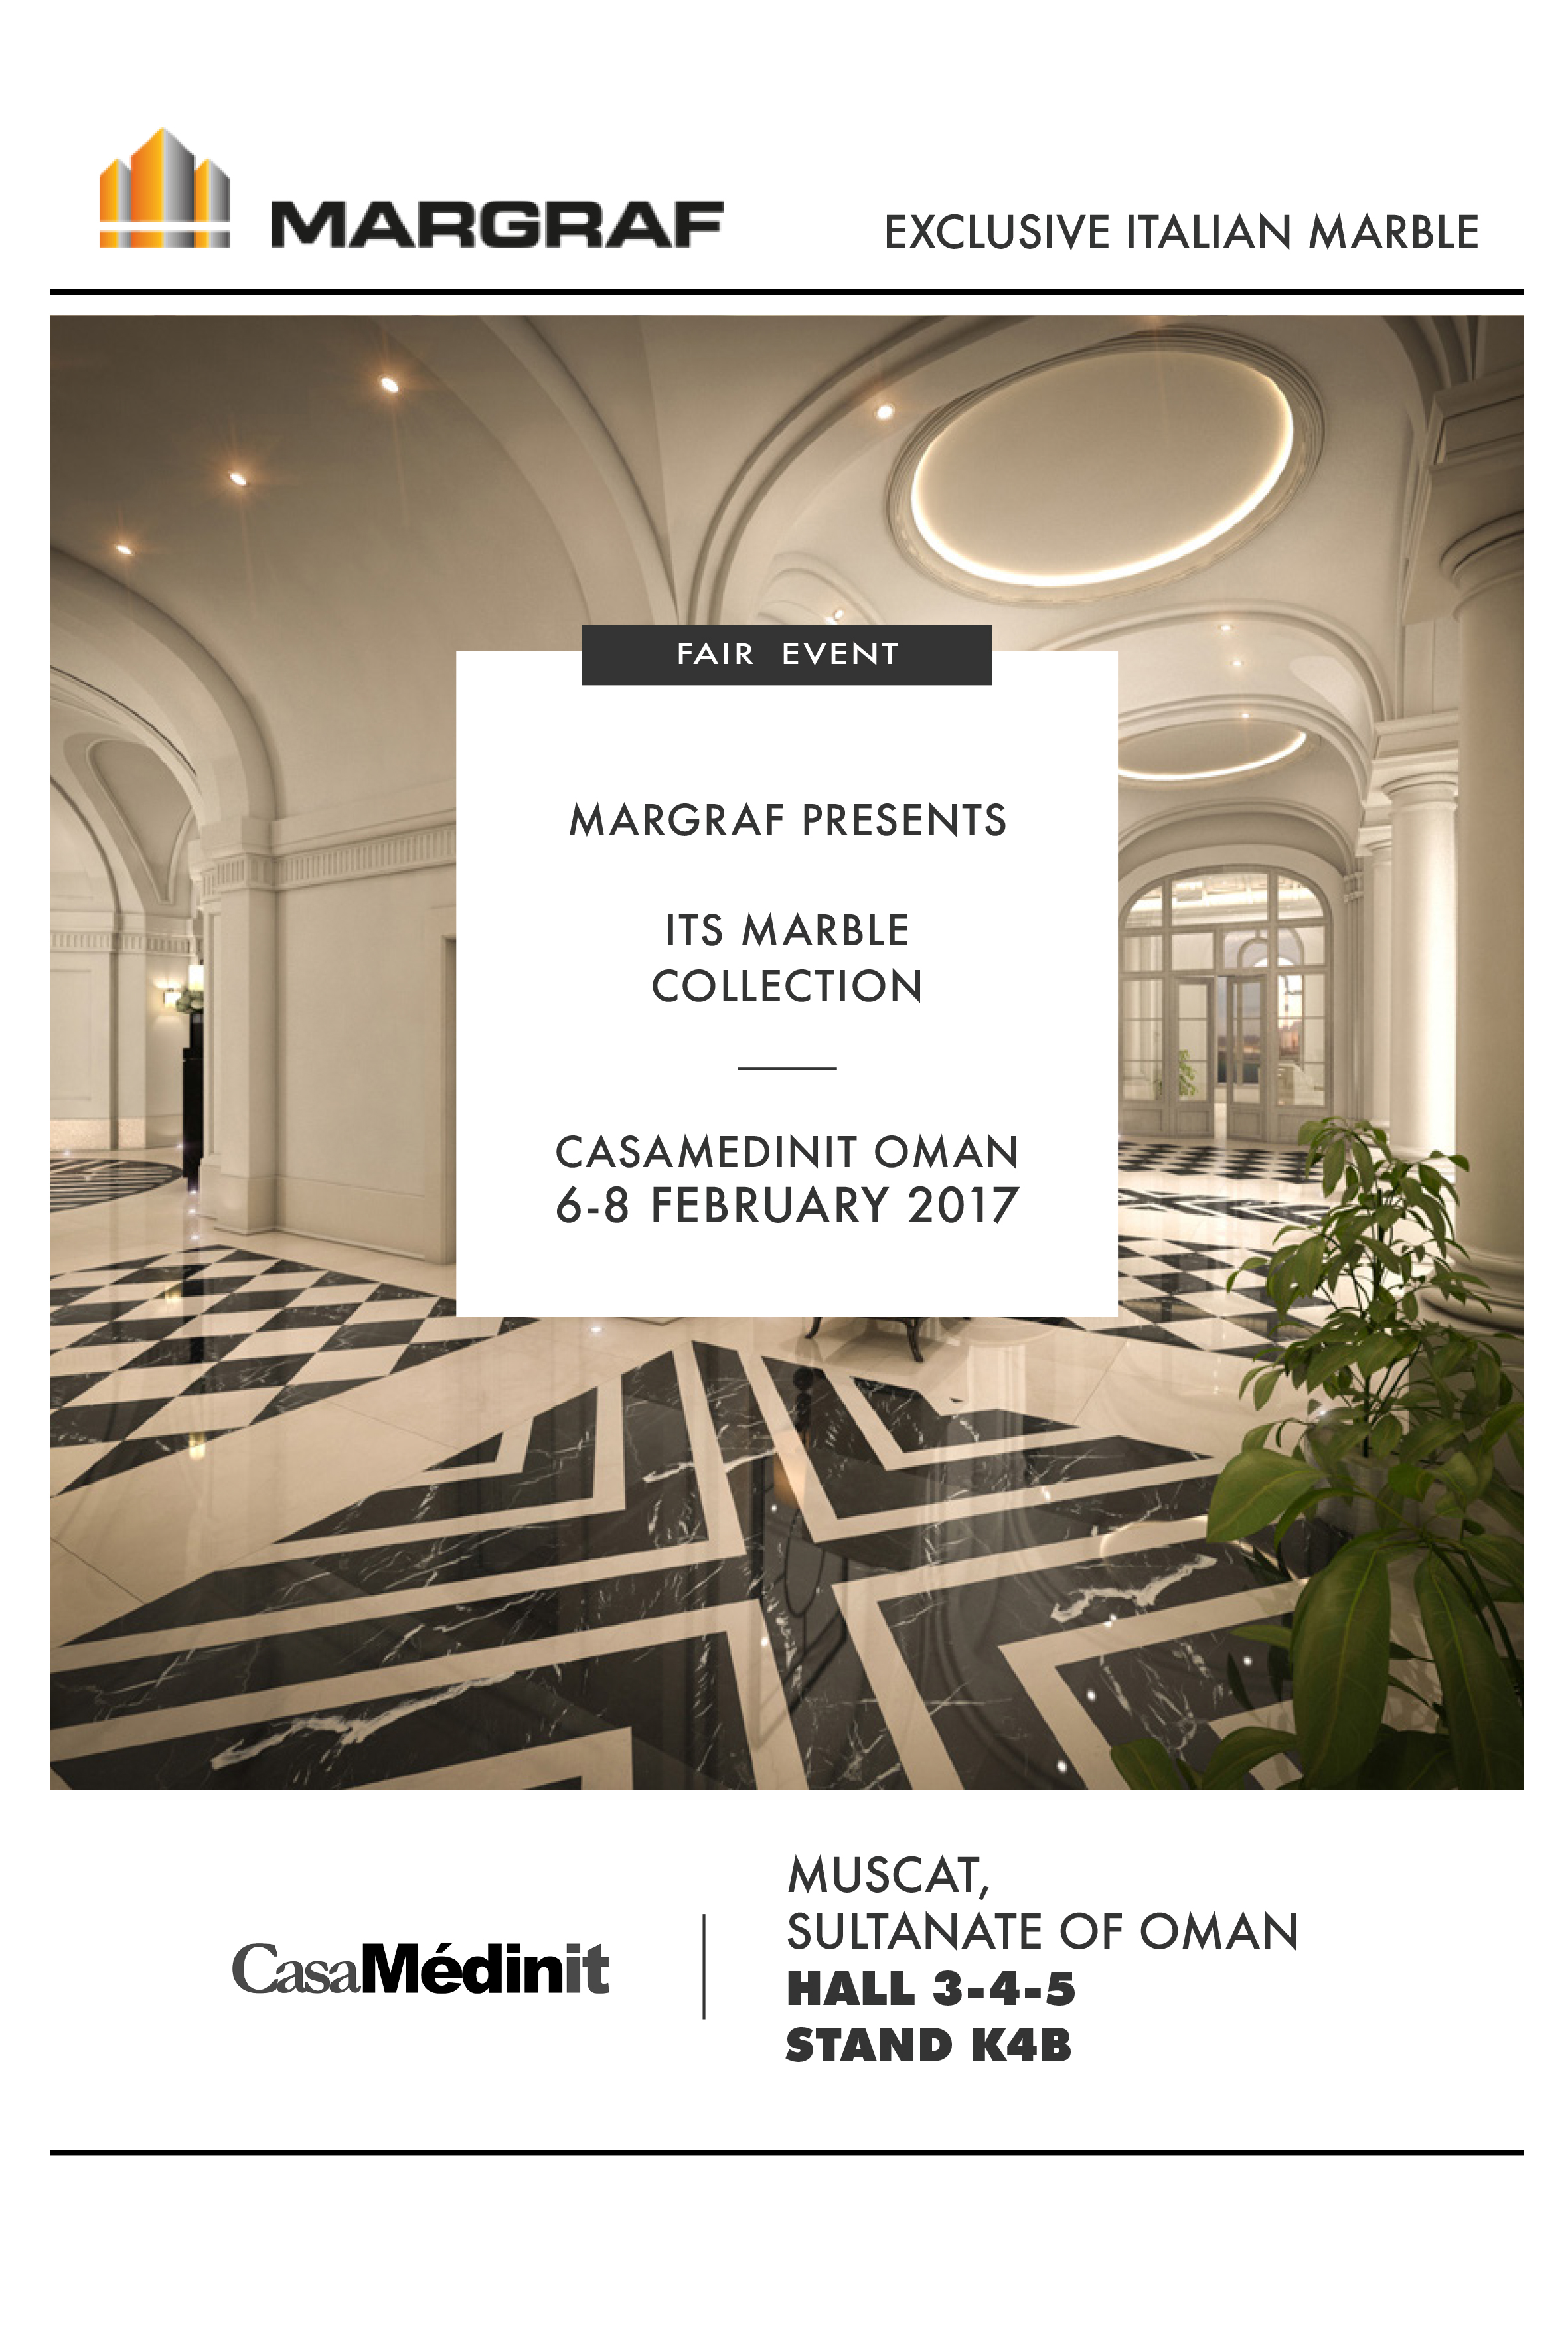 Newsletter_margraf_event_CasaMedinit_Oman_2018-3